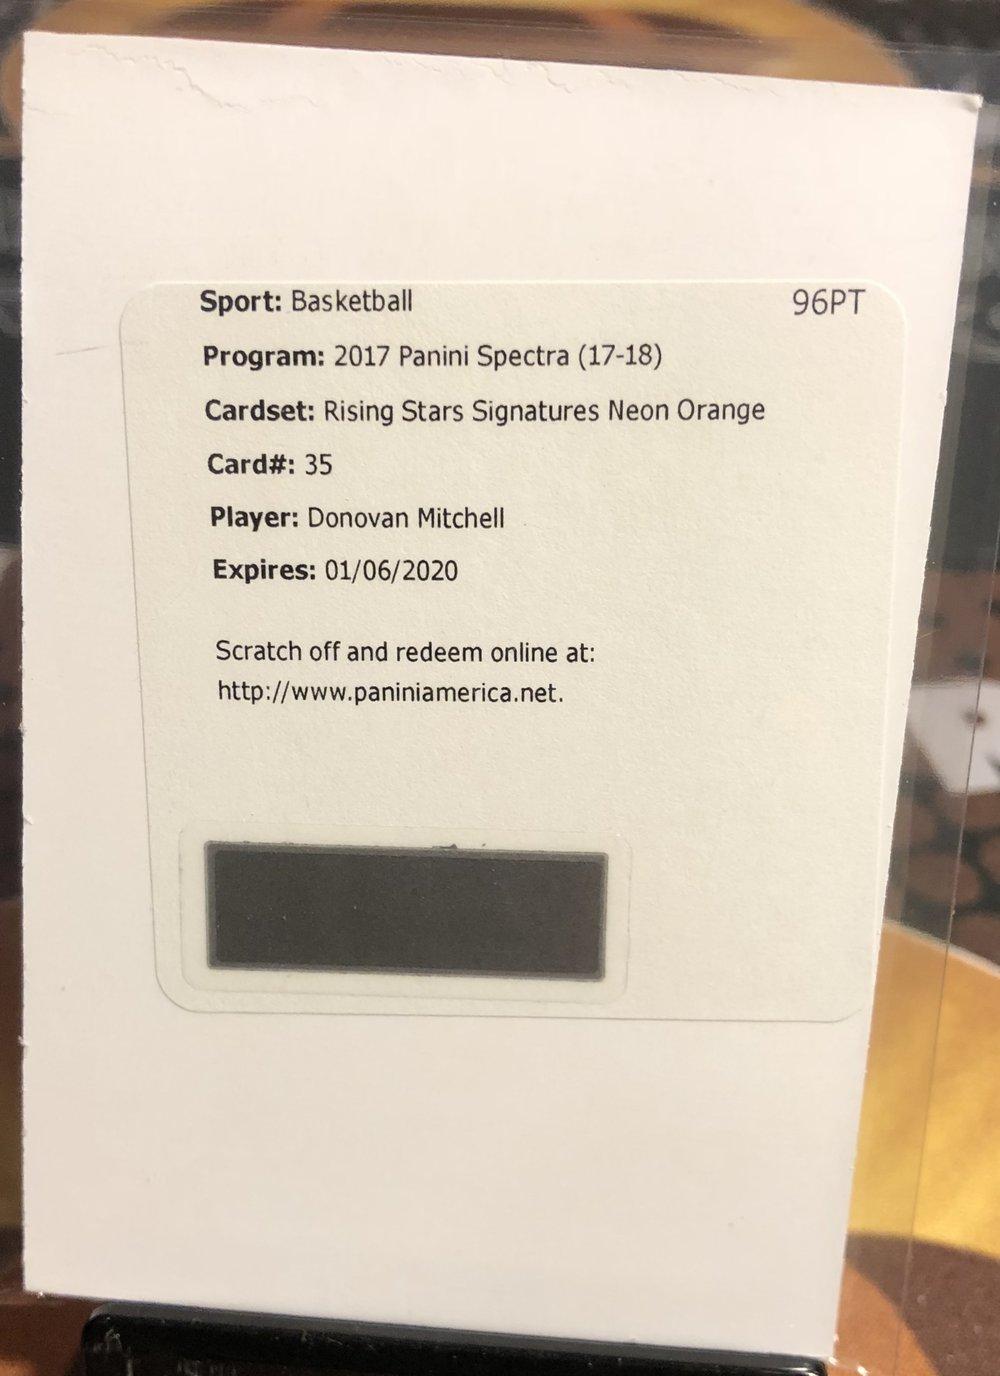 2017-18 Panini Spectra Donovan Mitchell Rising Stars Signatures Orange /5